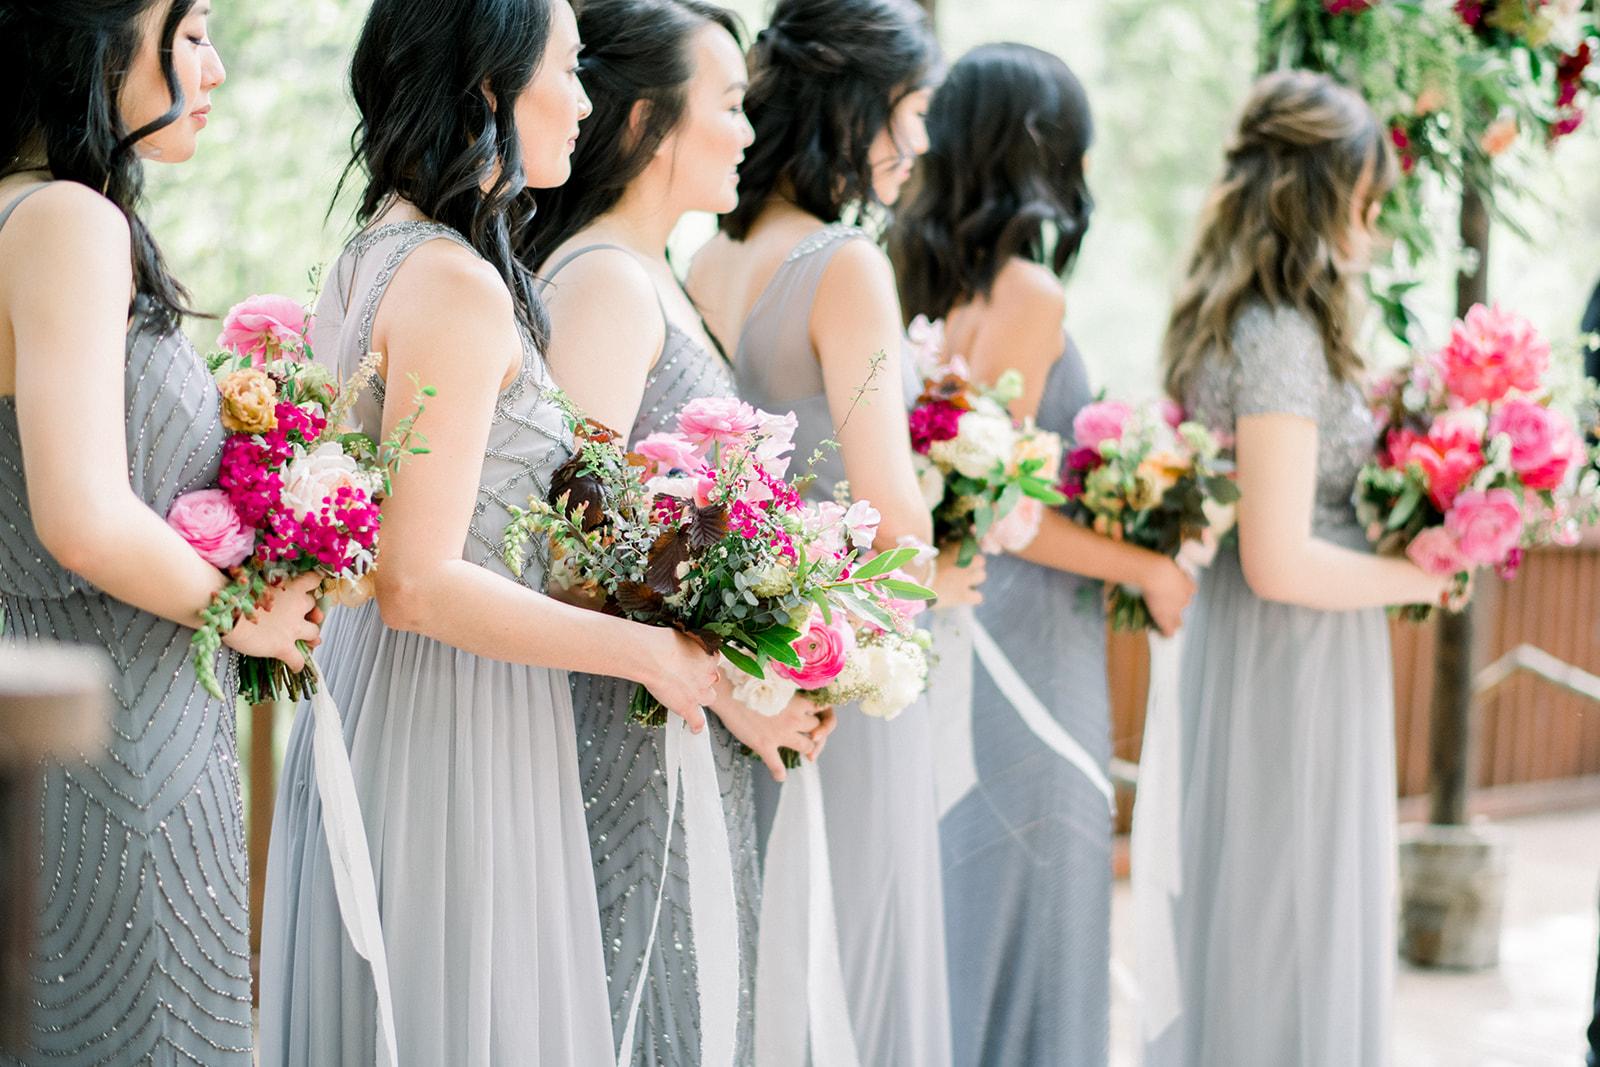 jueunandjon-etherandsmith-wedding-762.jpg